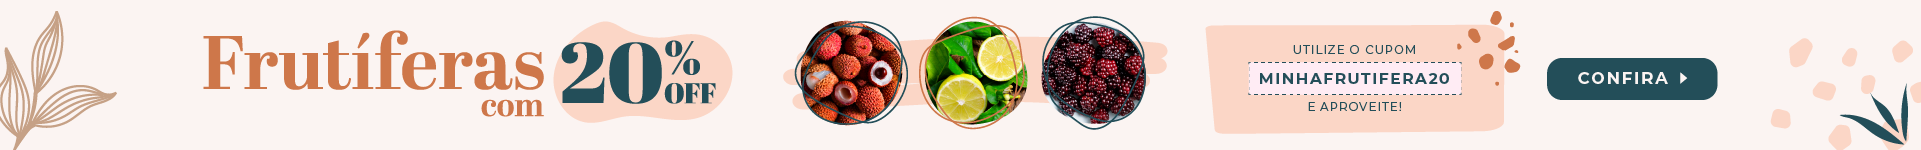 cupom para mudas frutiferas